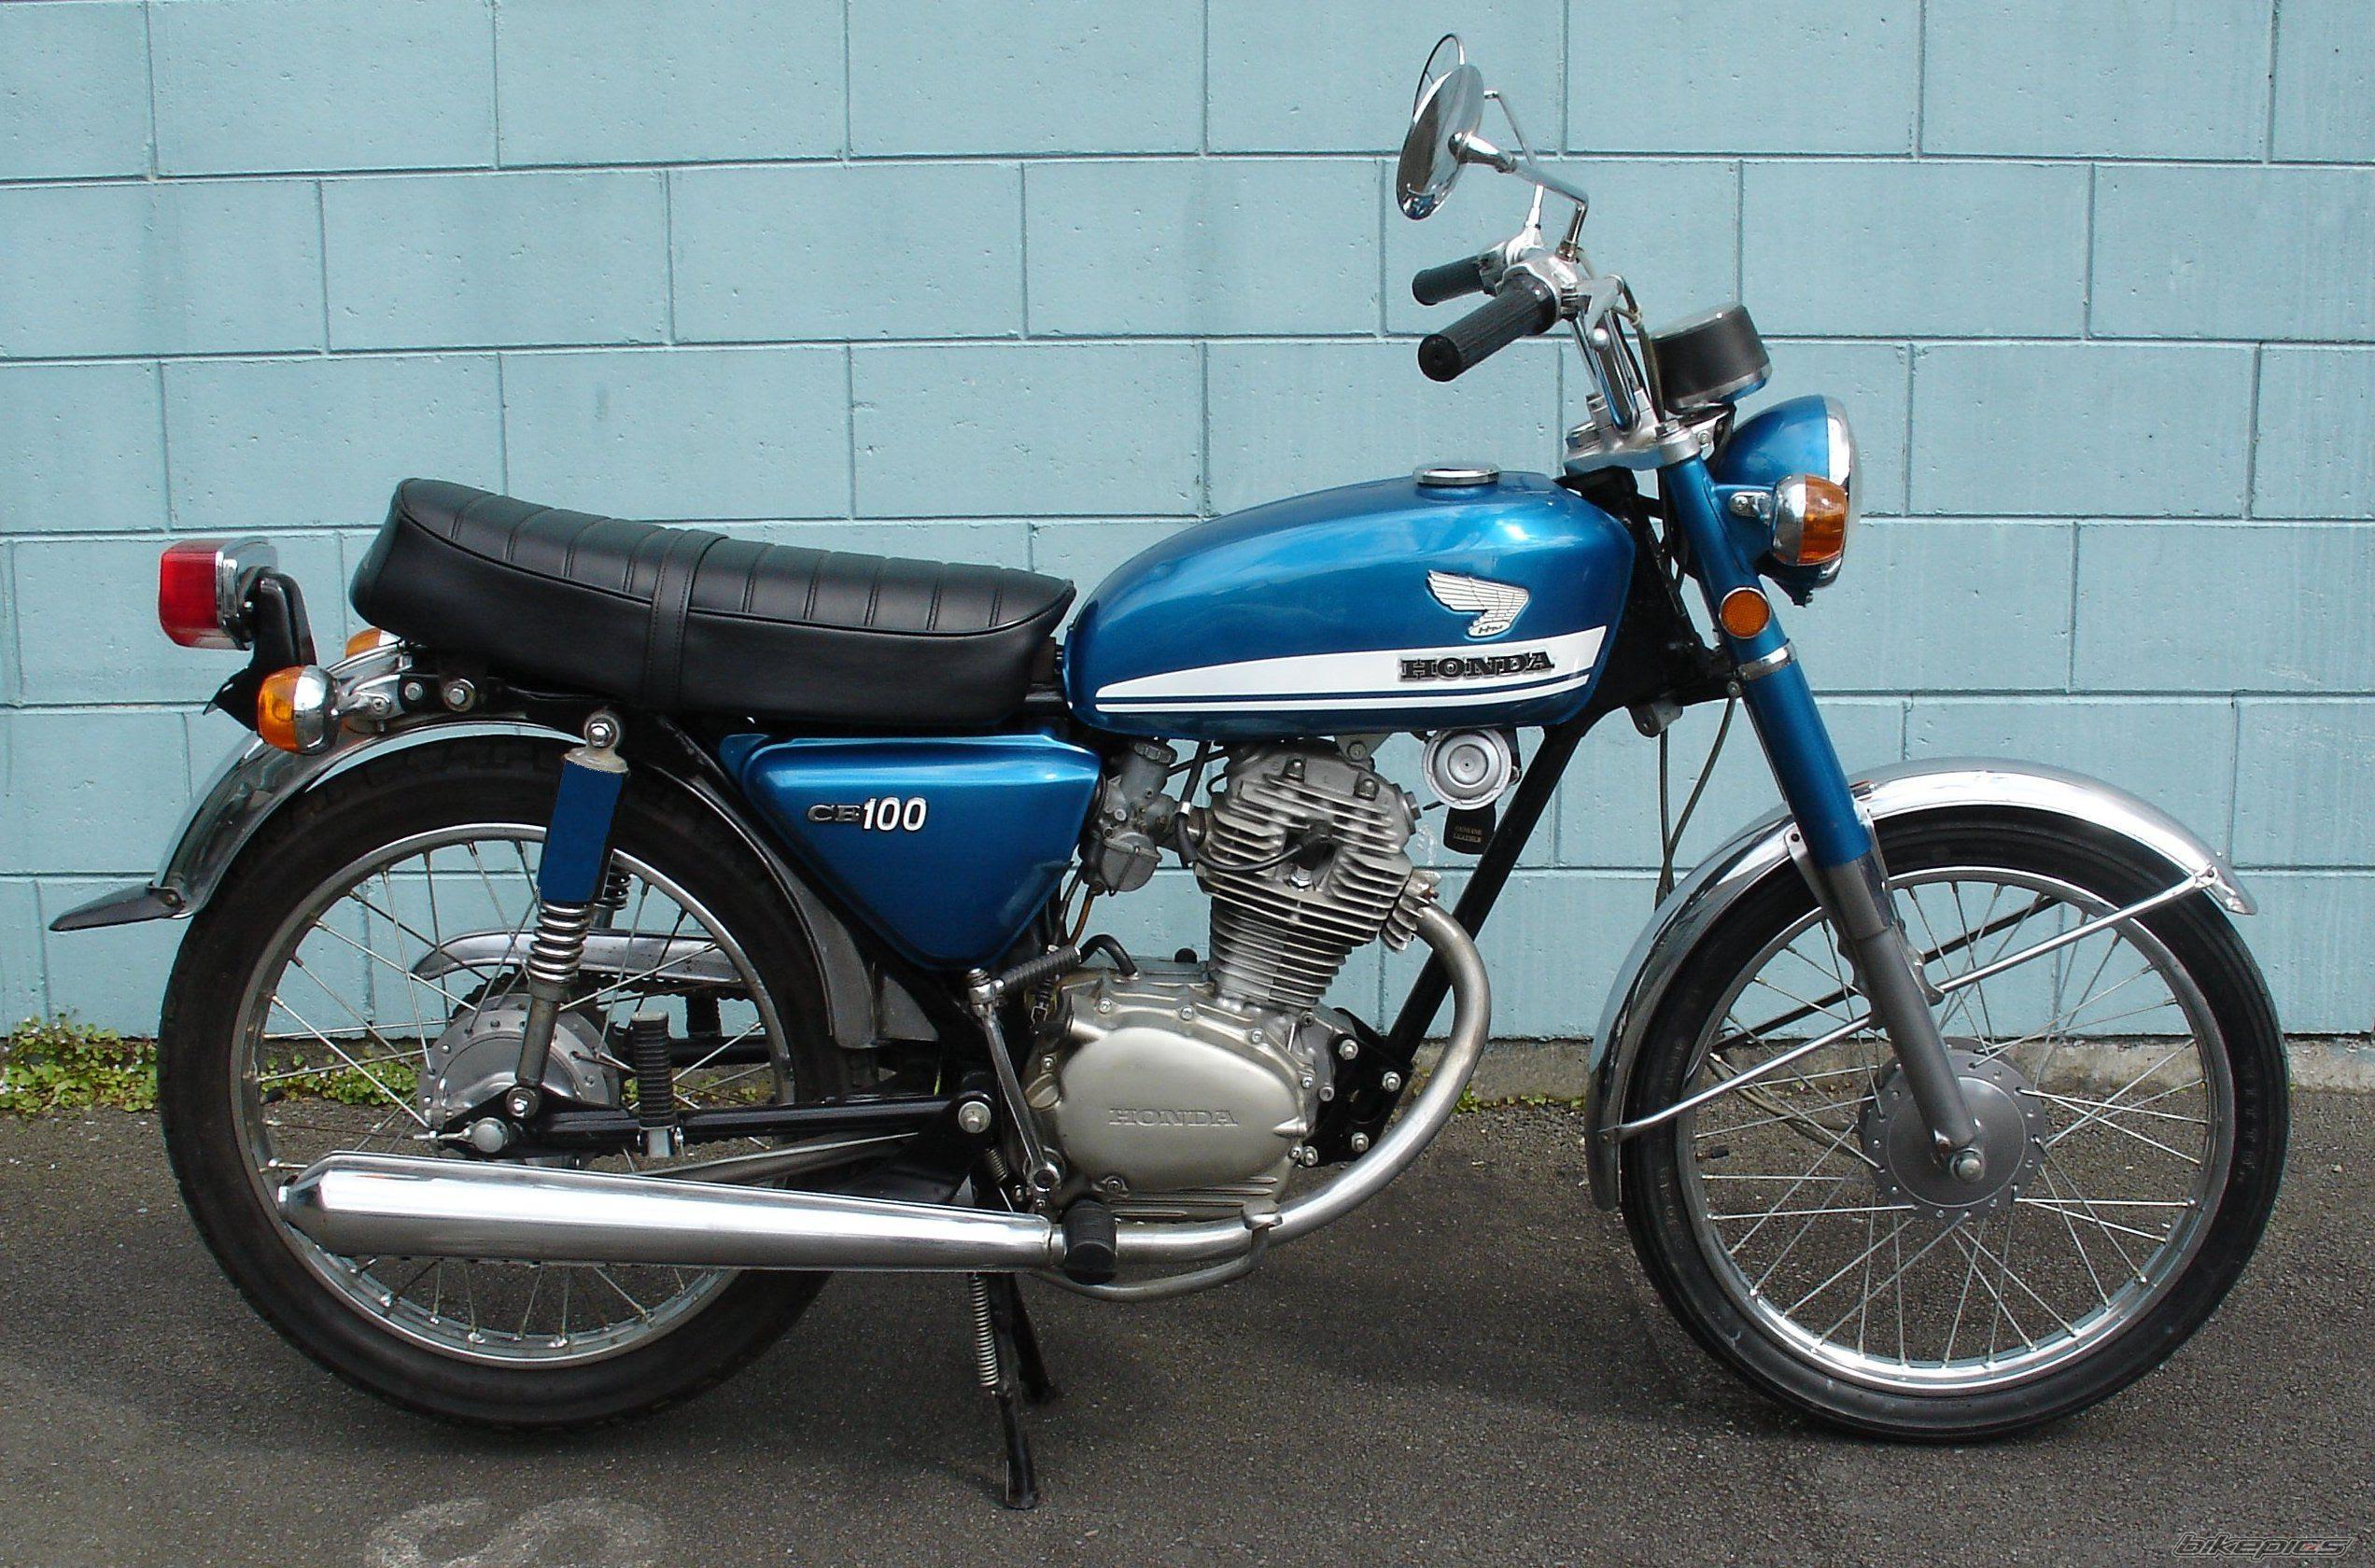 102 Modifikasi Motor Cb Orisinil Modifikasi Motor Honda CB Terbaru